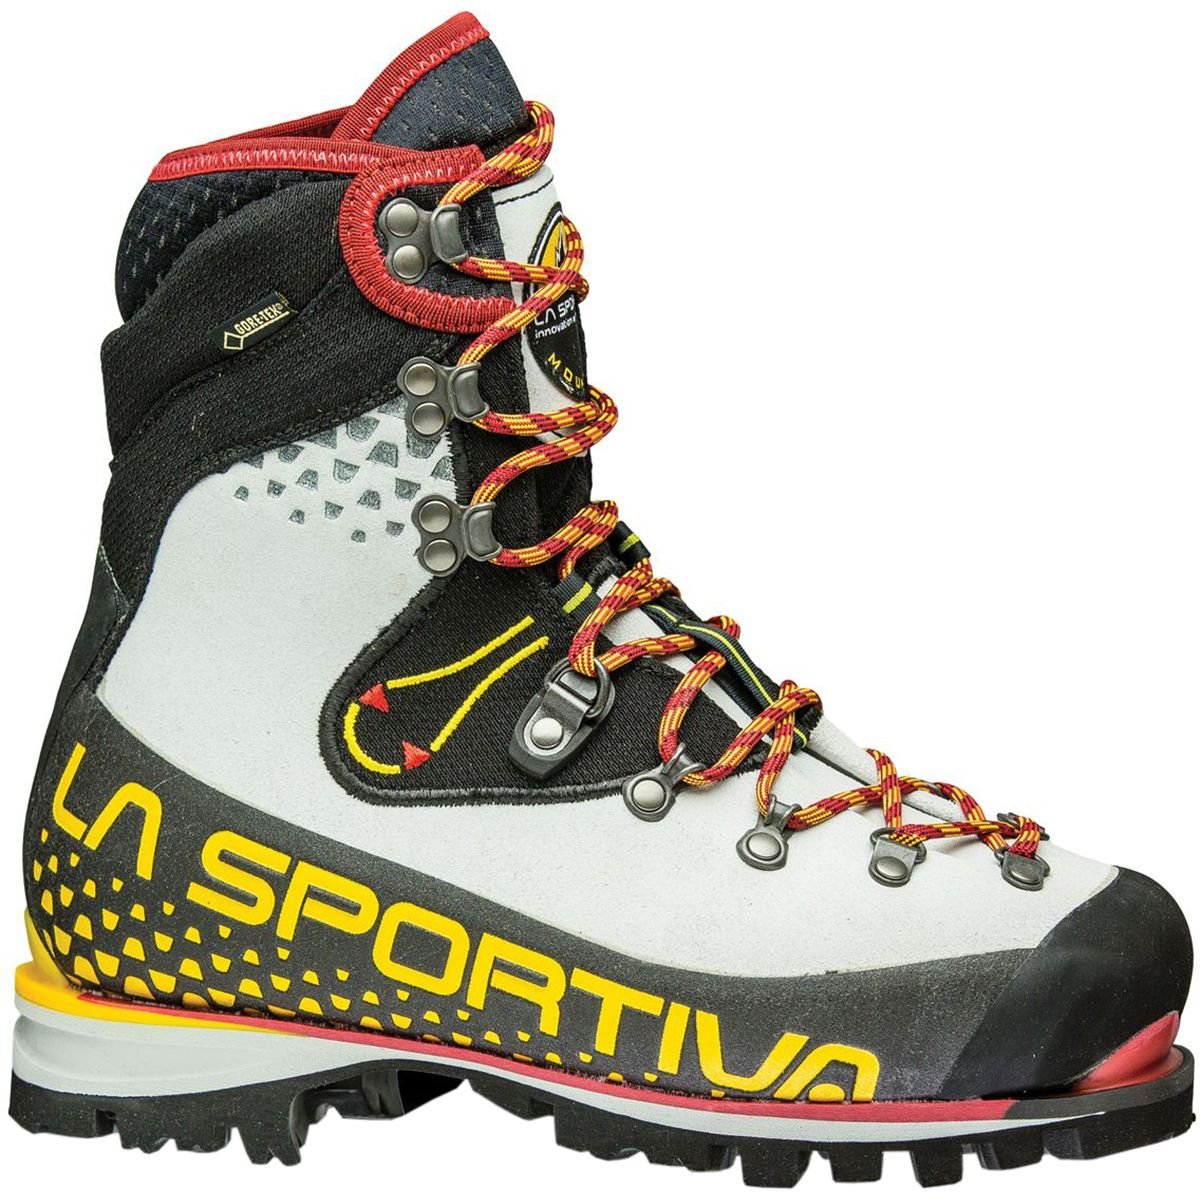 La Sportiva Nepal Cube GTX Mountaineering Boot - Women's B0101629ZQ 37 M EU|Ice